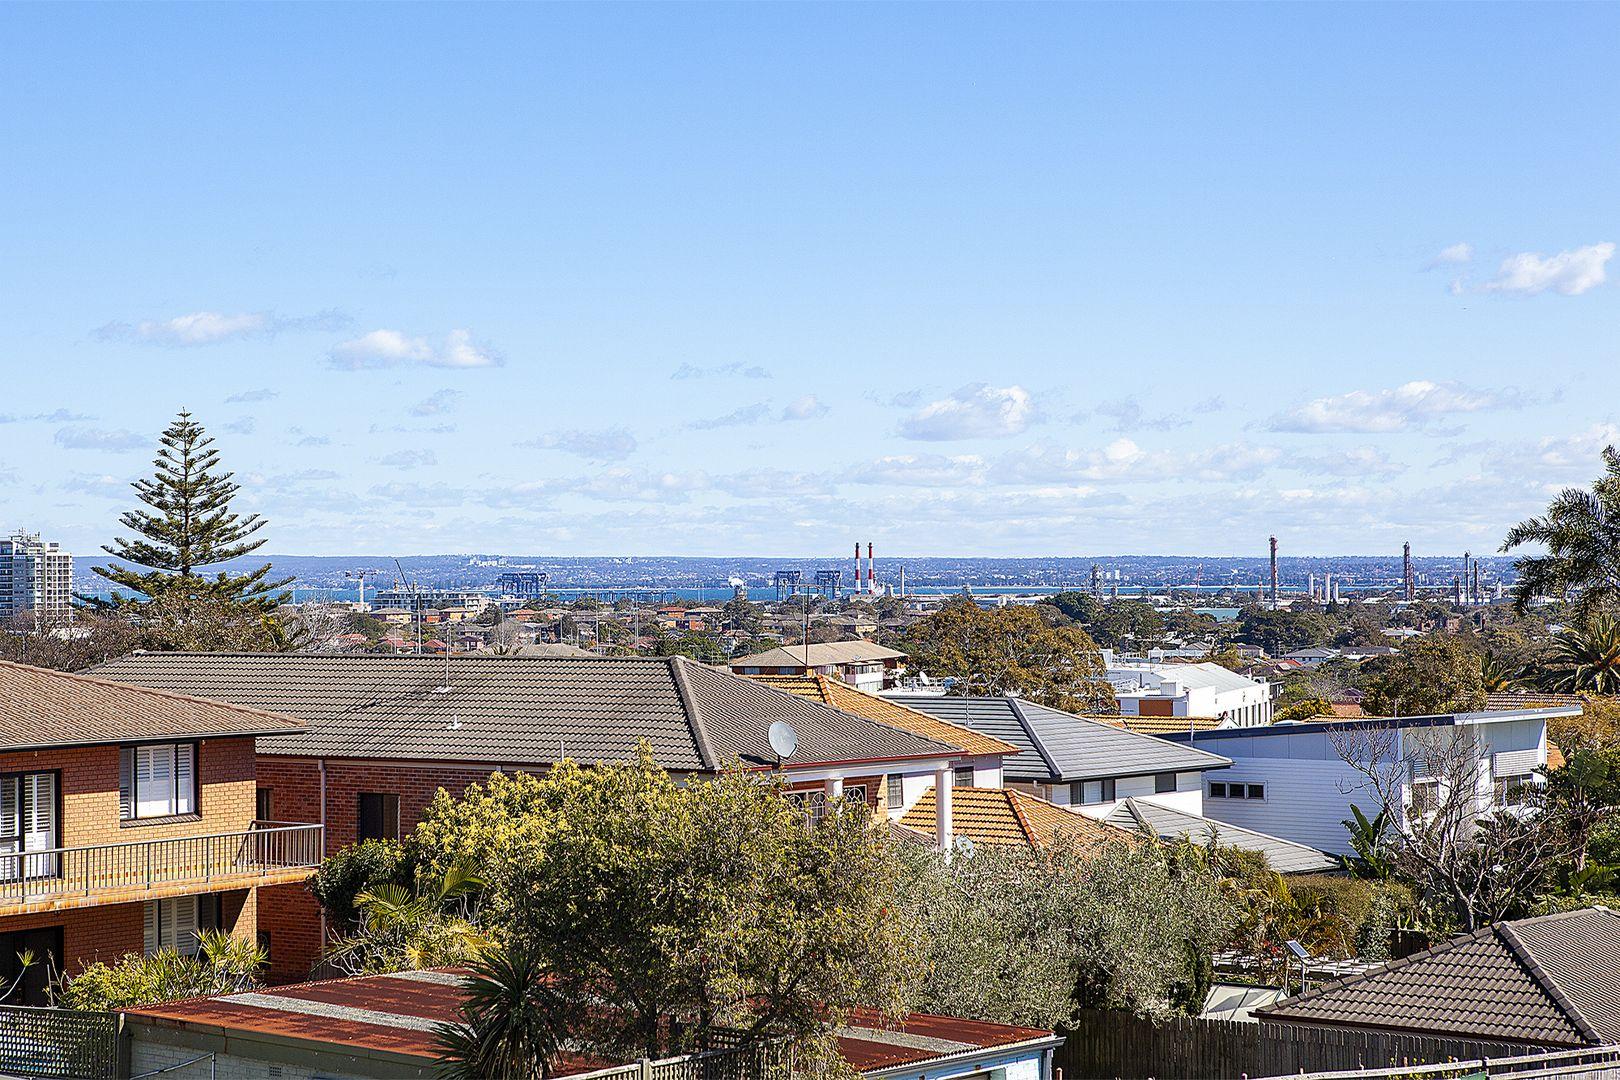 12/285 MAROUBRA ROAD, Maroubra NSW 2035, Image 1